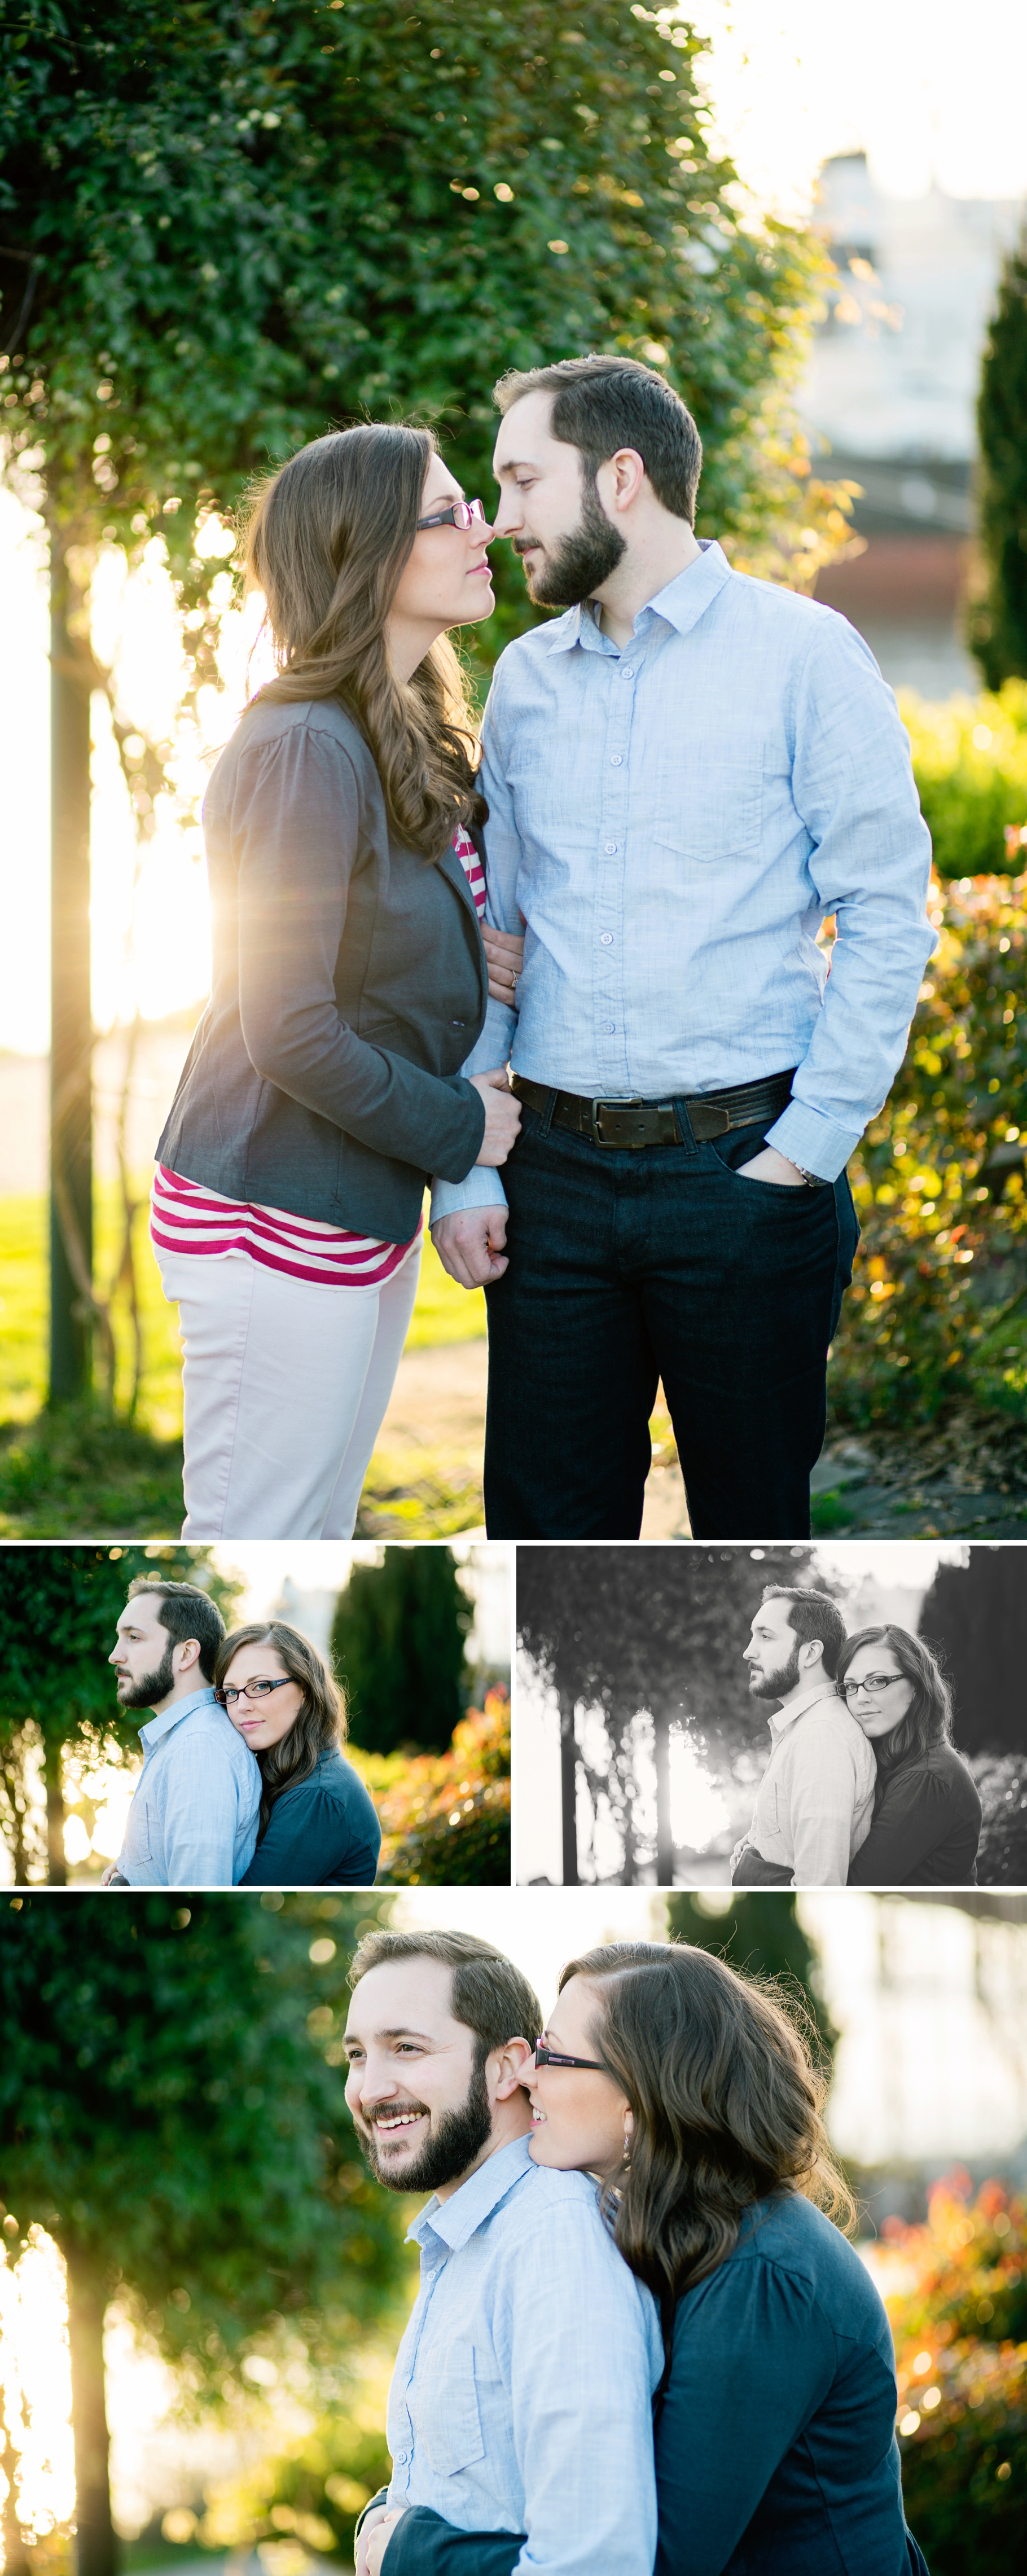 9-Melinda-Tom-Engaged-Seattle-Waterfront-Elliot-Bay-Trail-Garden-Sunset-Romantic-Photographer-Wedding-Photography-by-Betty-Elaine